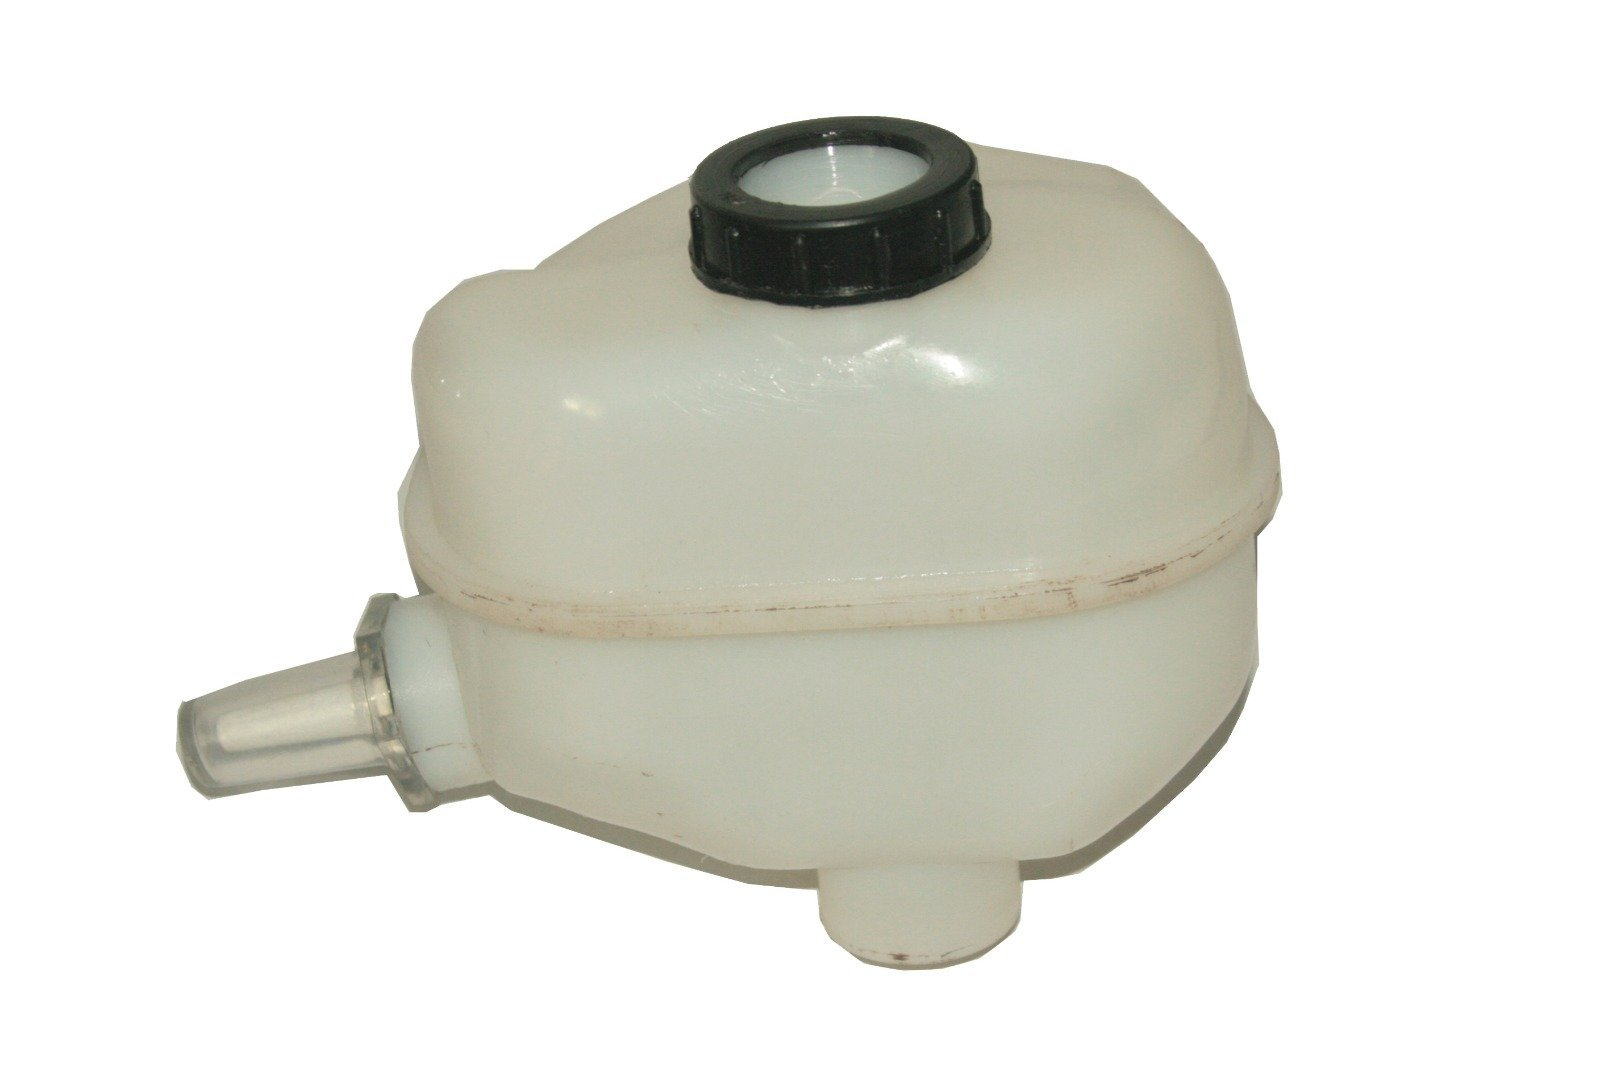 RS Vintage Parts RSV-B00ZFS7LAO-00810 Autolube Oil Tank + Oil Sight Glass Vespa PX 125 150 200 EFL T5 Lusso Scoot